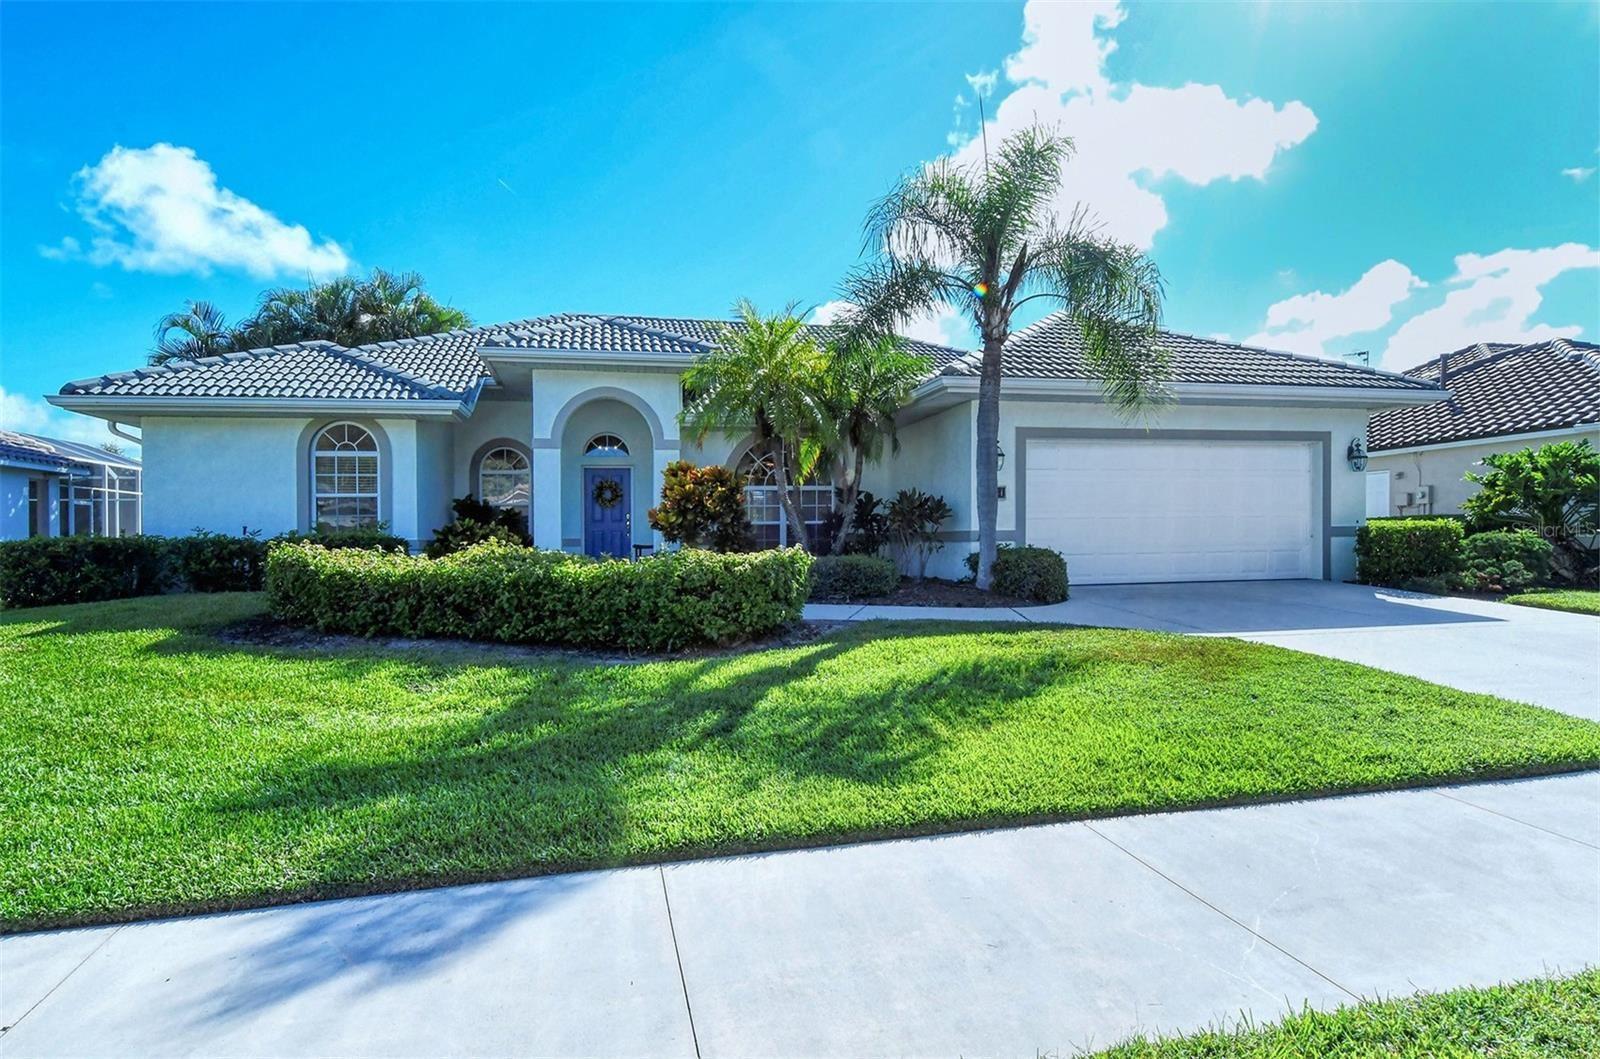 8541 GREAT MEADOW DRIVE, Sarasota, FL 34238 - #: A4514954